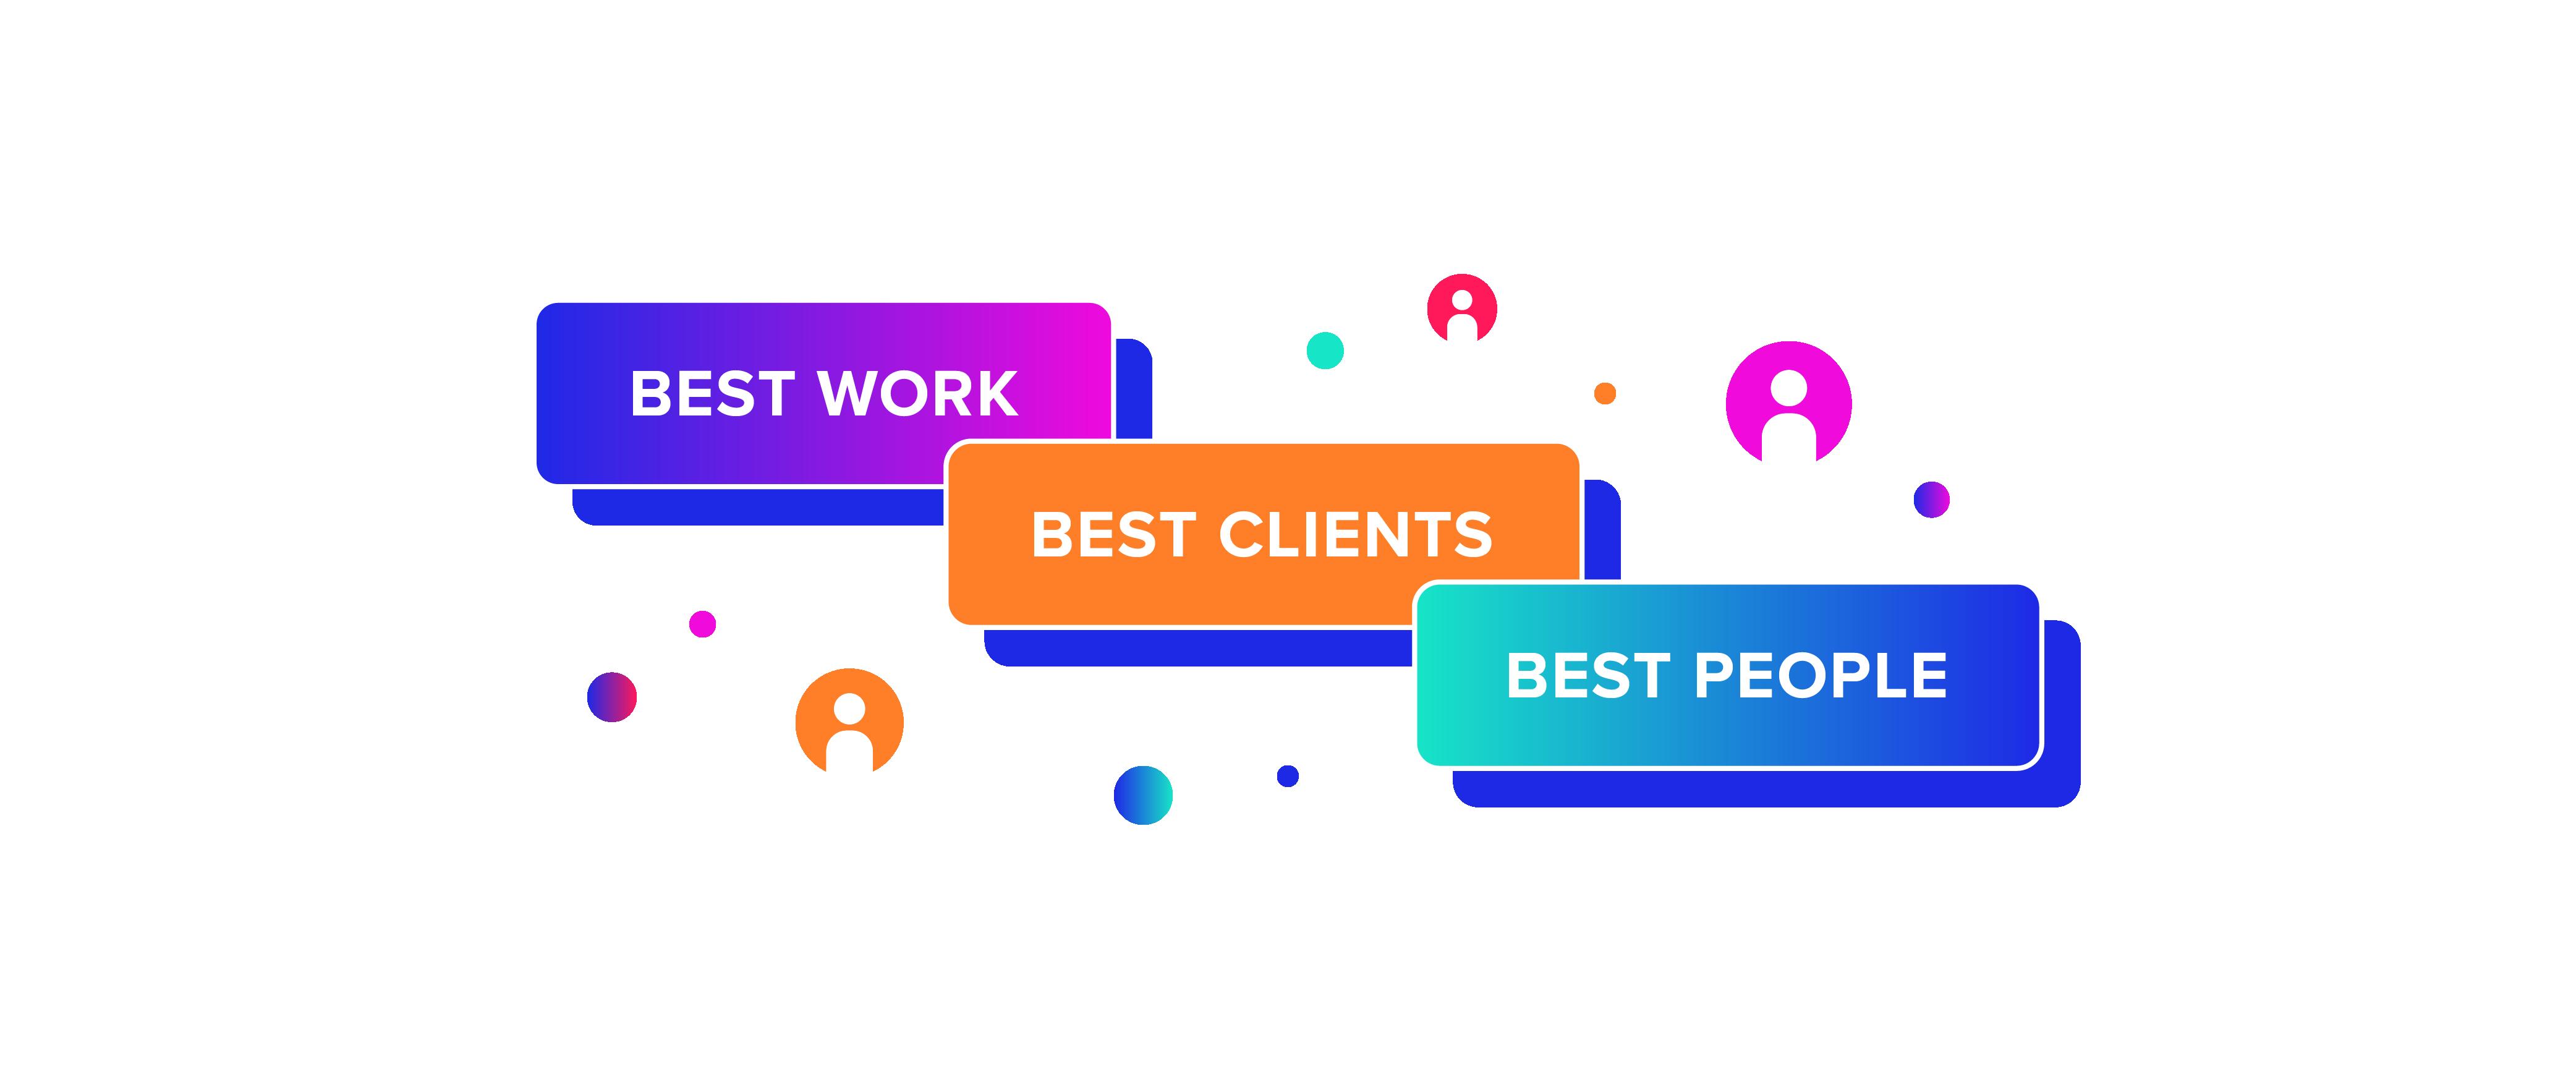 Best Work, Best Clients, Best People